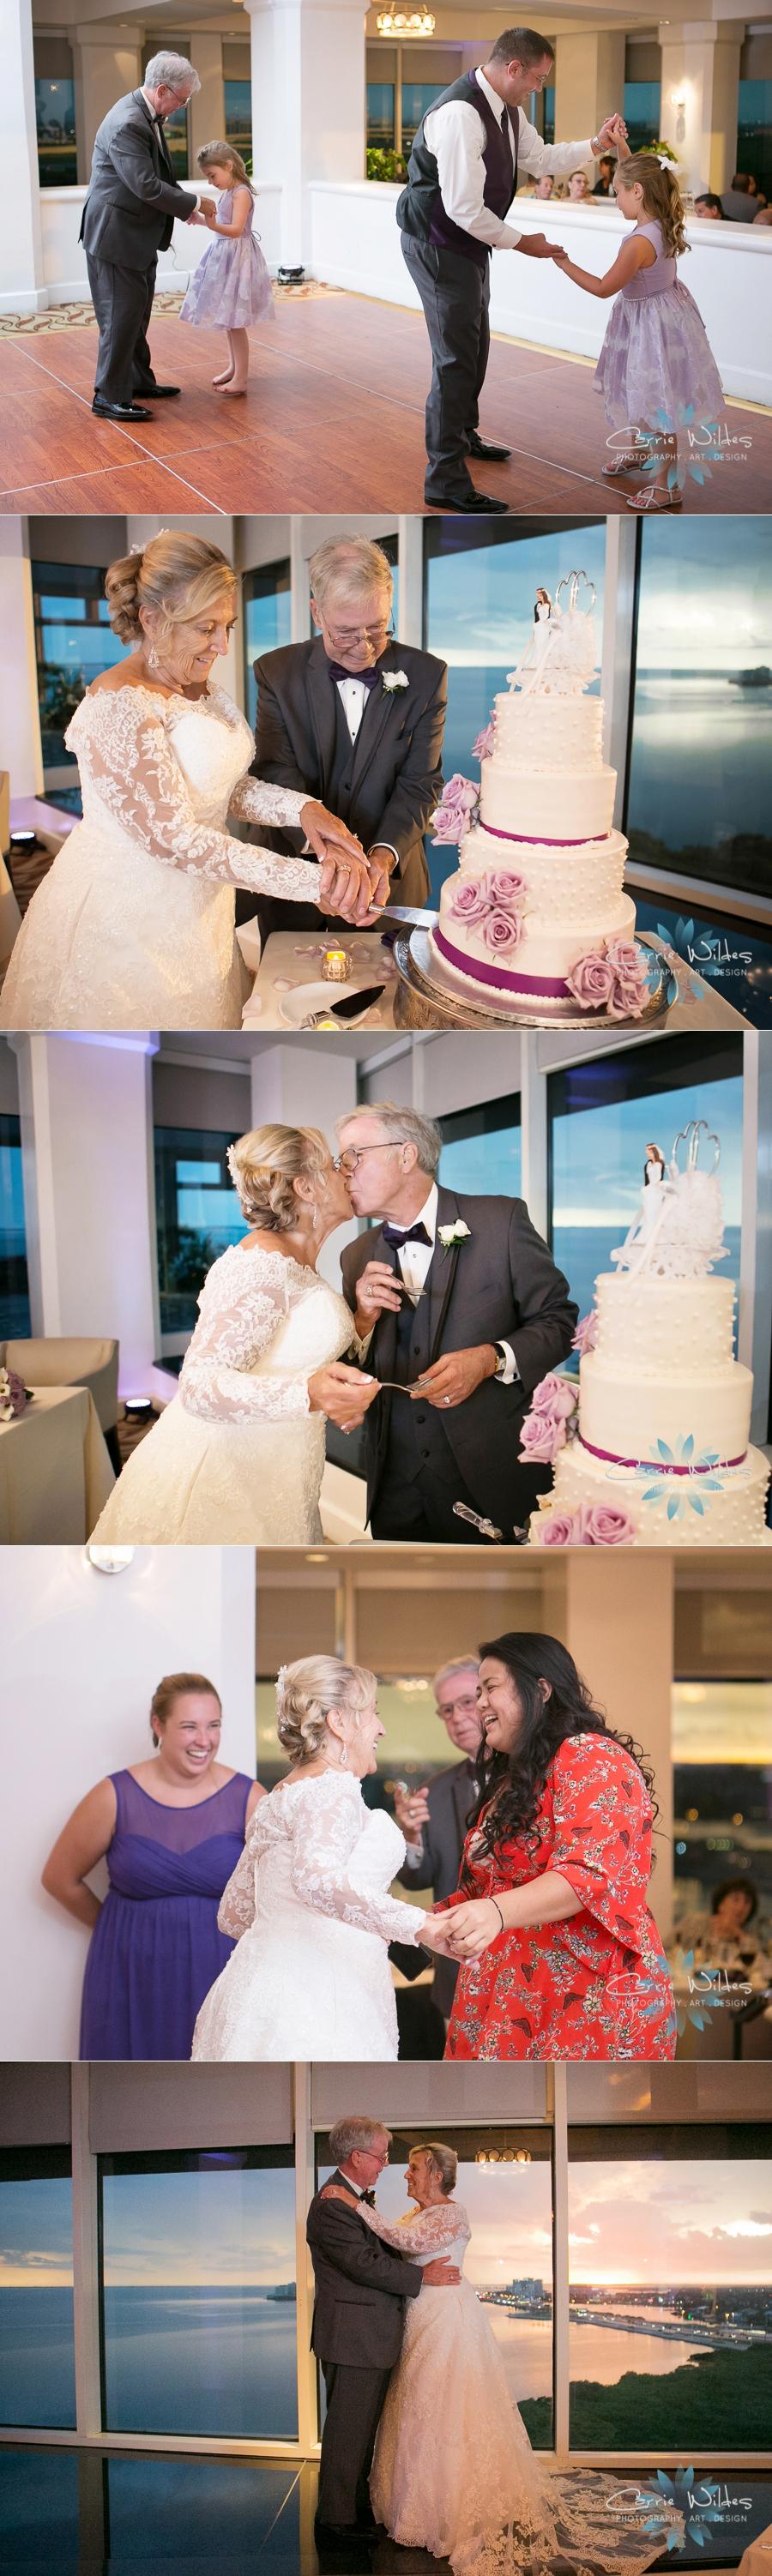 8_5_18 Donna and Bob Grand Hyatt Armani's Wedding_0014.jpg